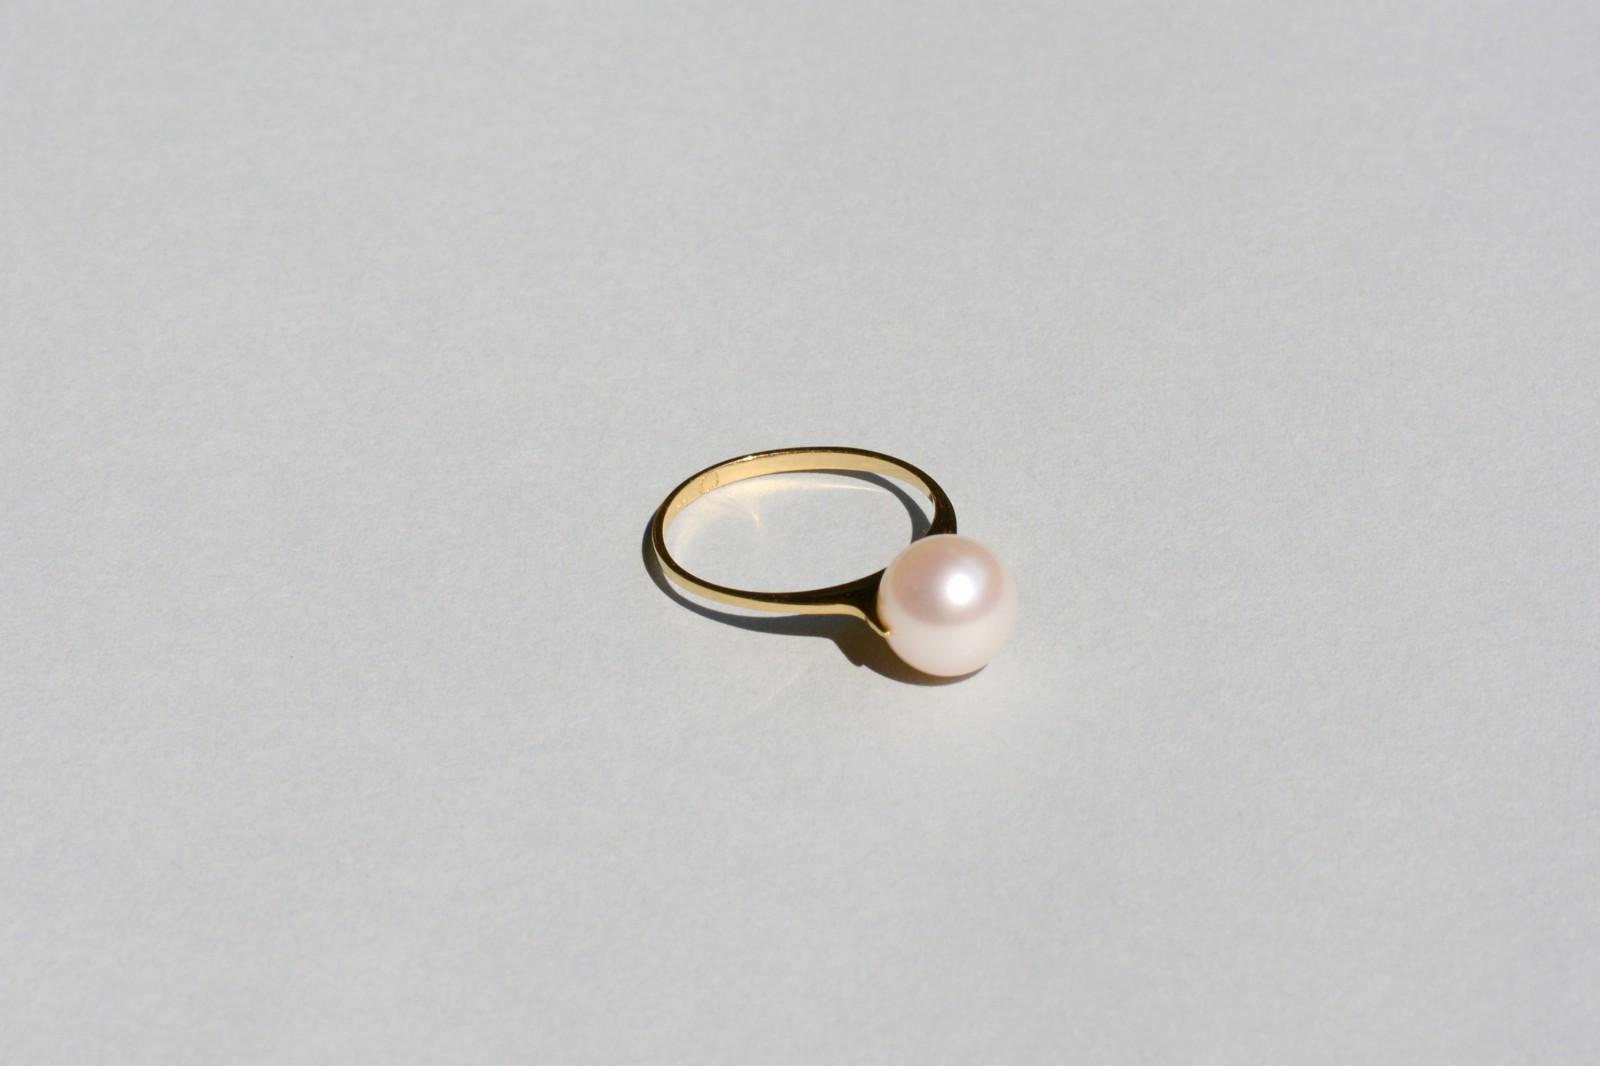 Saskia Diez Pearly circle earrings RIx5JaHNyL